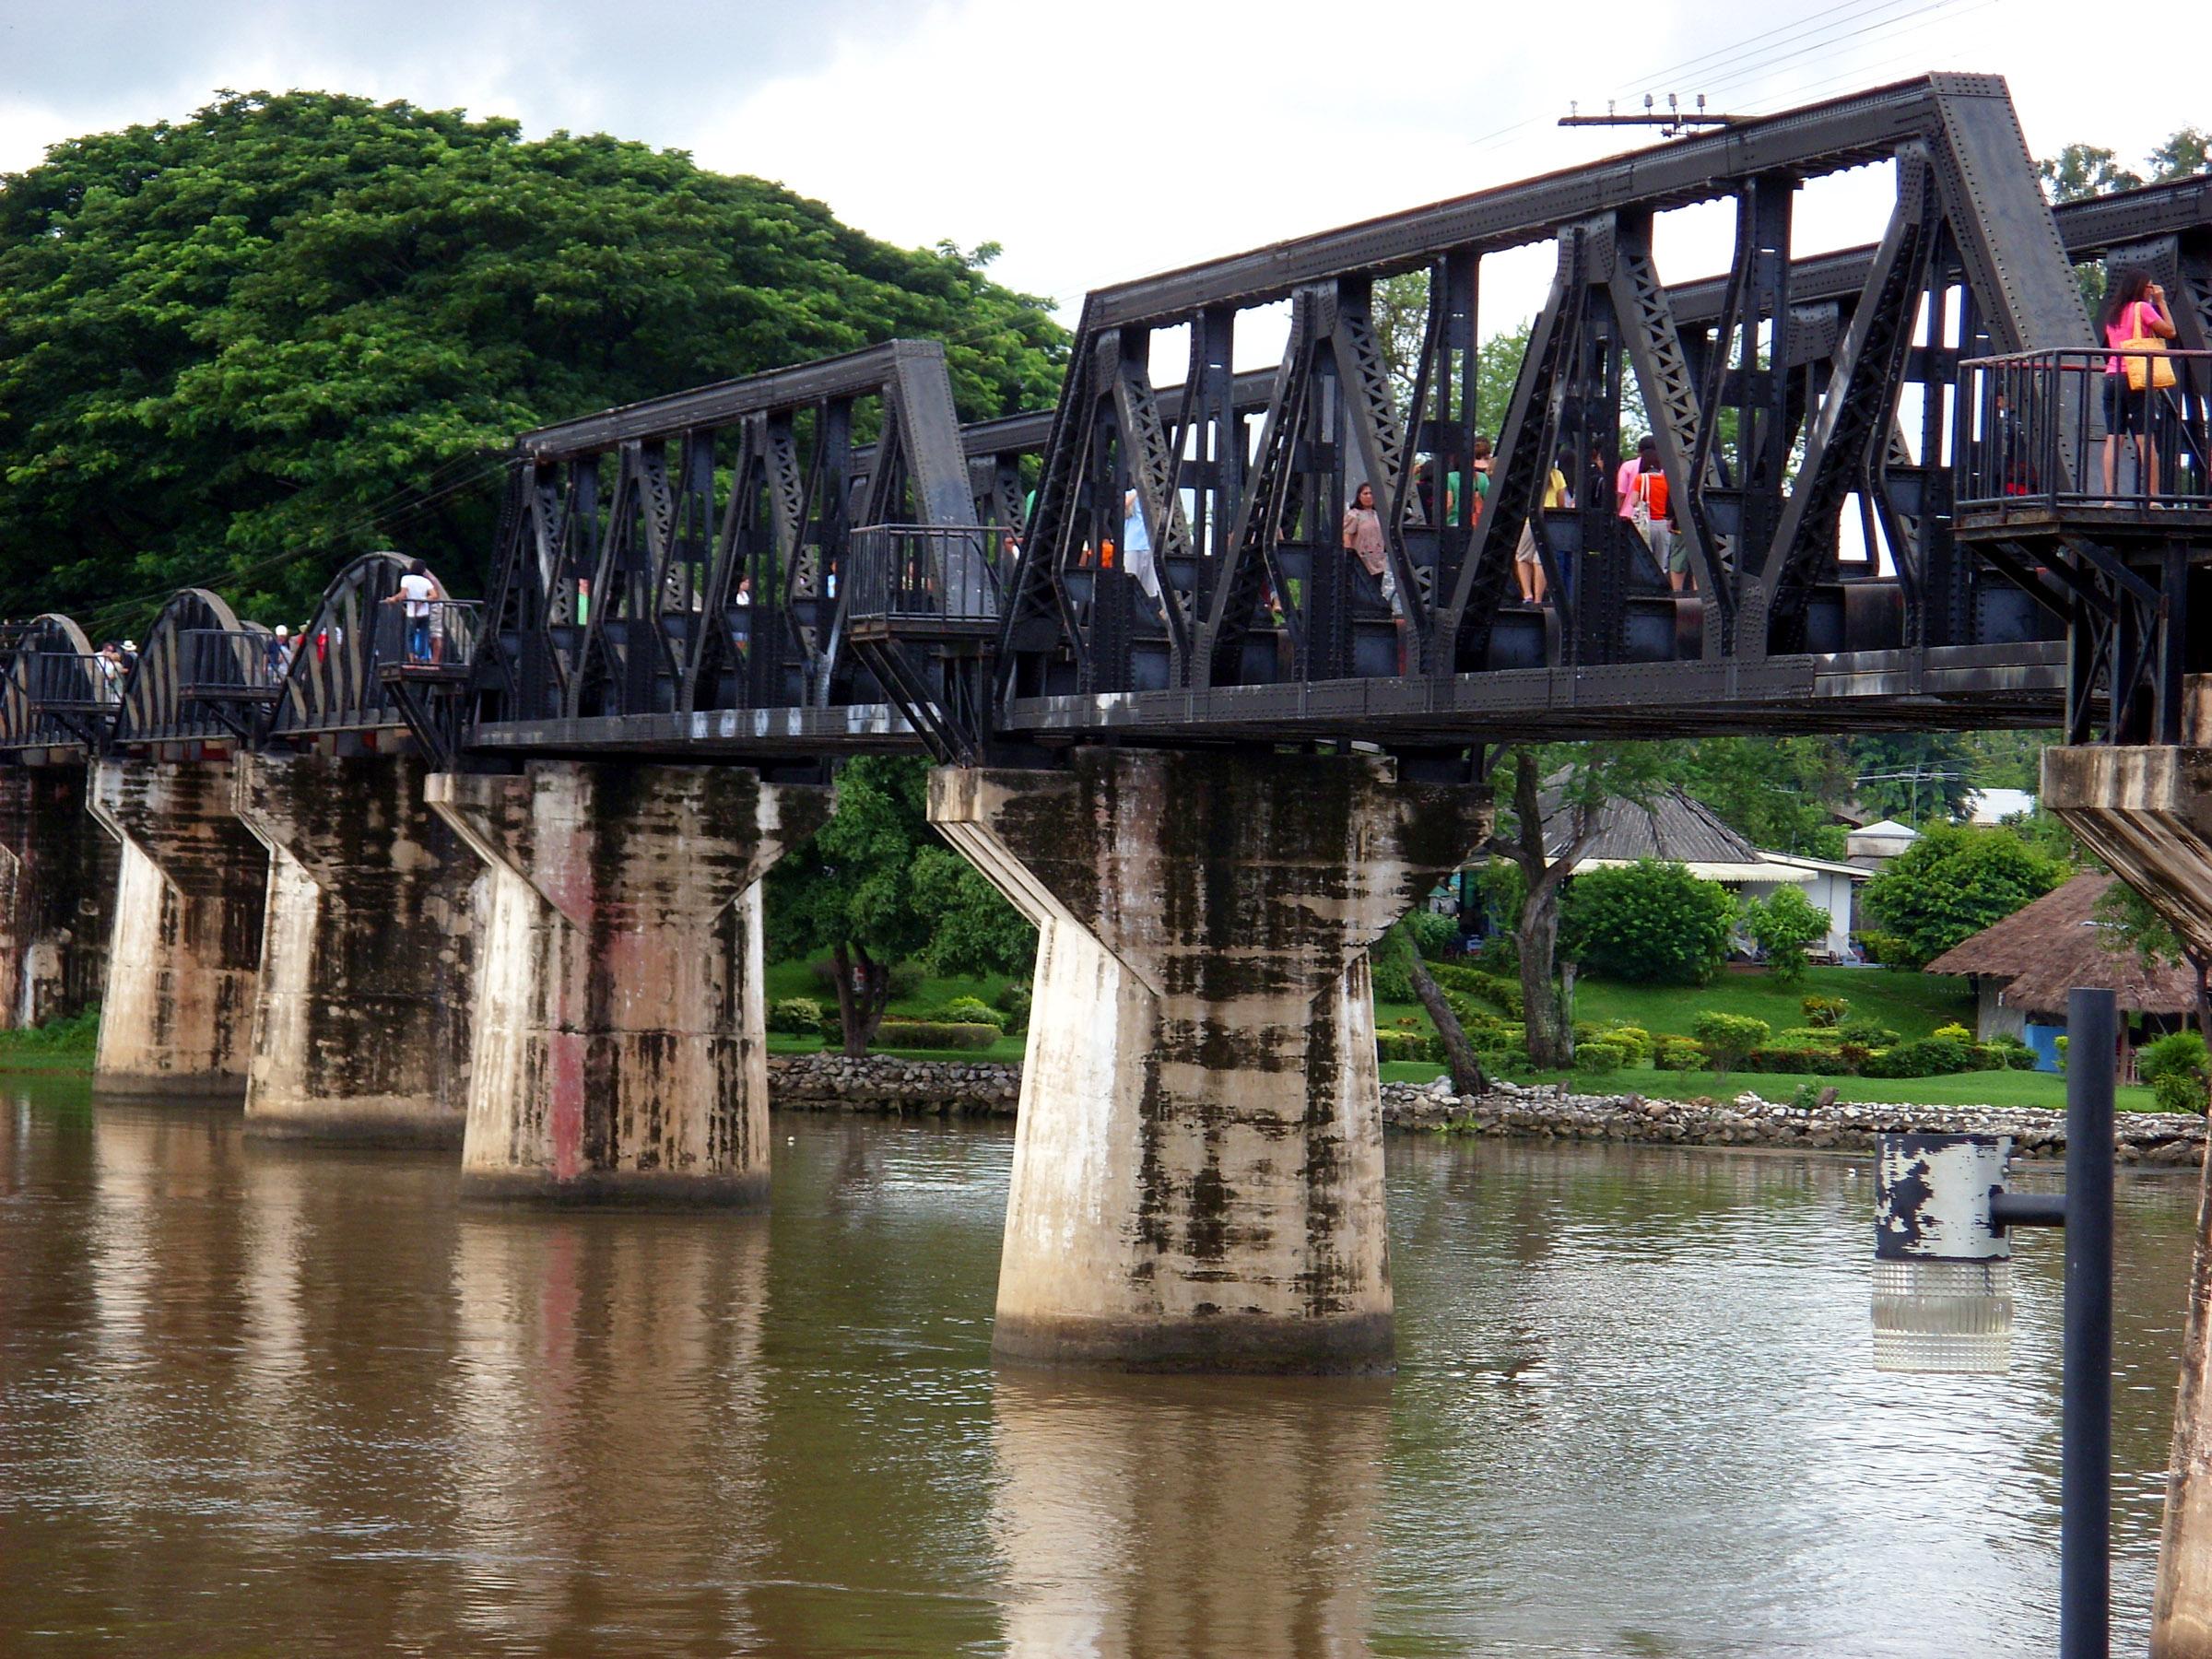 The Bridge on the River Kwai, Bridge, Captive, Cruelty, Japanese, HQ Photo